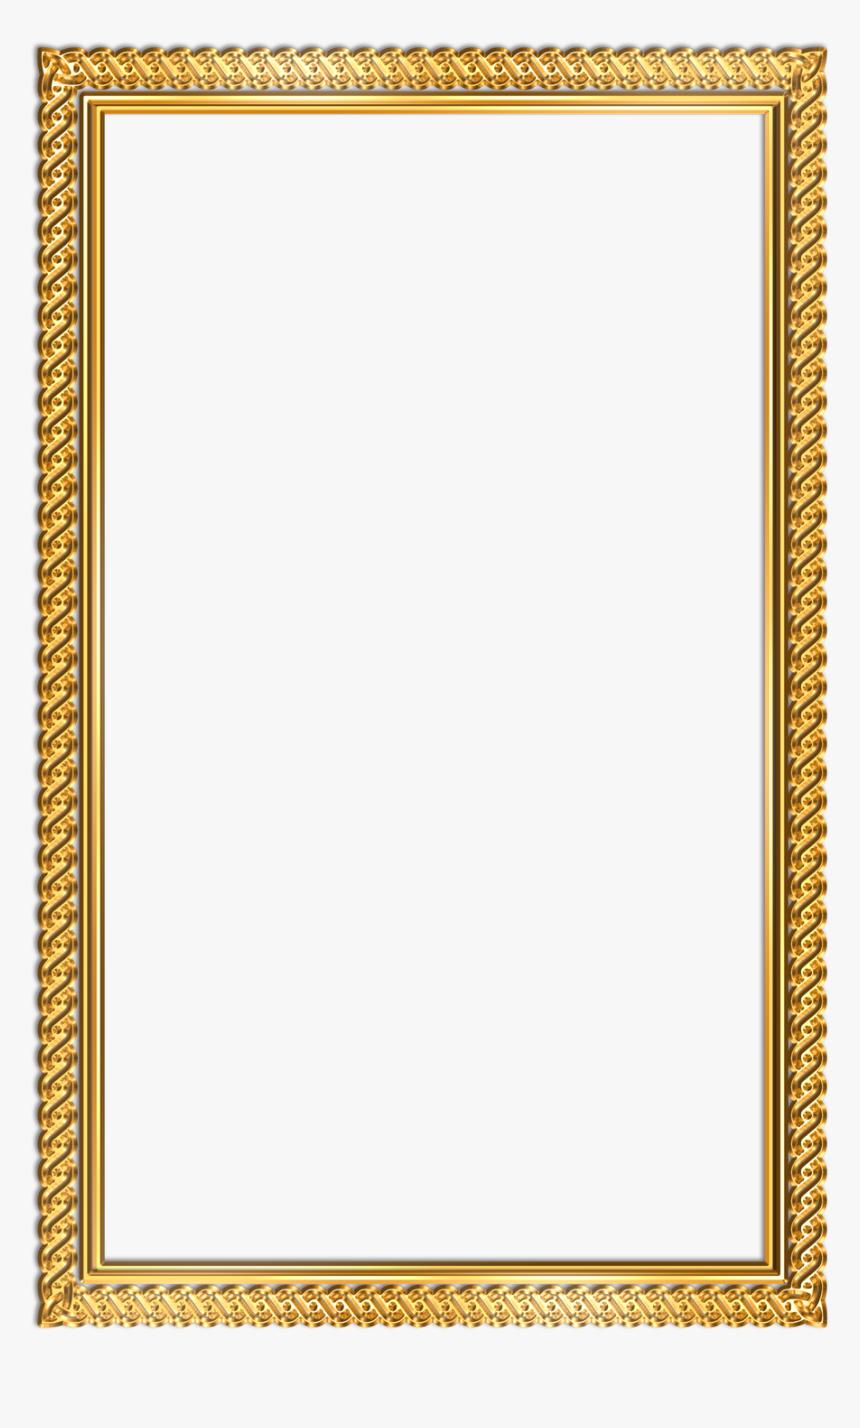 Golden Photo Frame Png Transparent Png Kindpng All images is transparent background and free 1156*844 size:216 kb. golden photo frame png transparent png